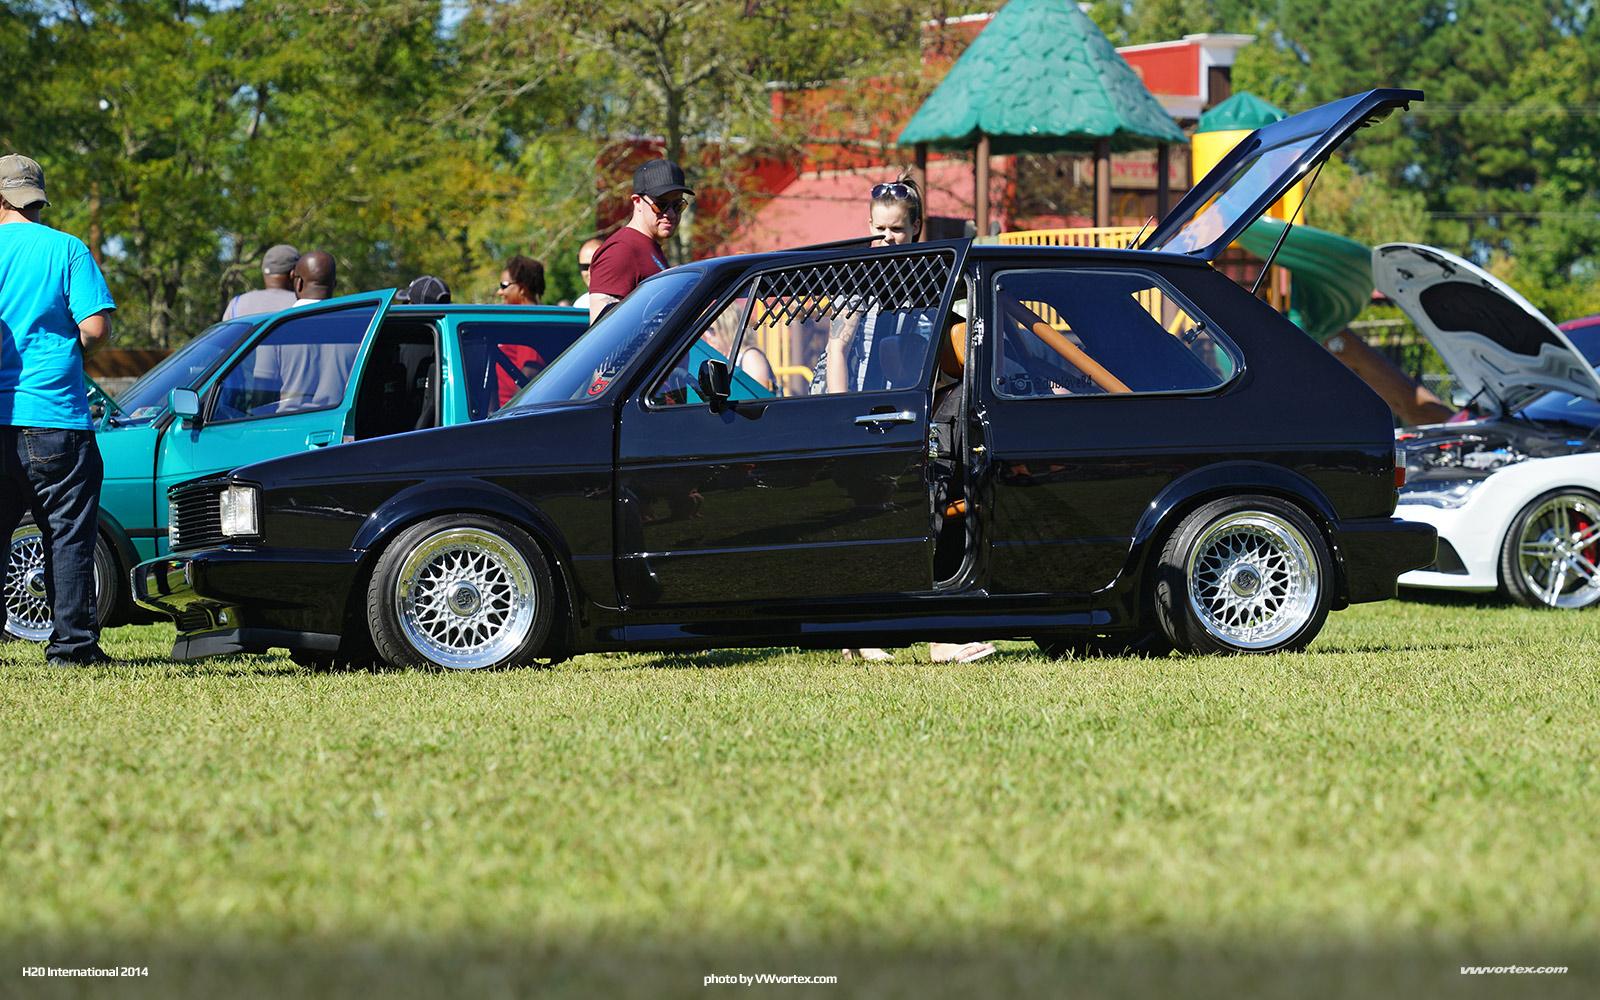 2014-H20i-H20-International-VW-Volkswagen-Audi-1351